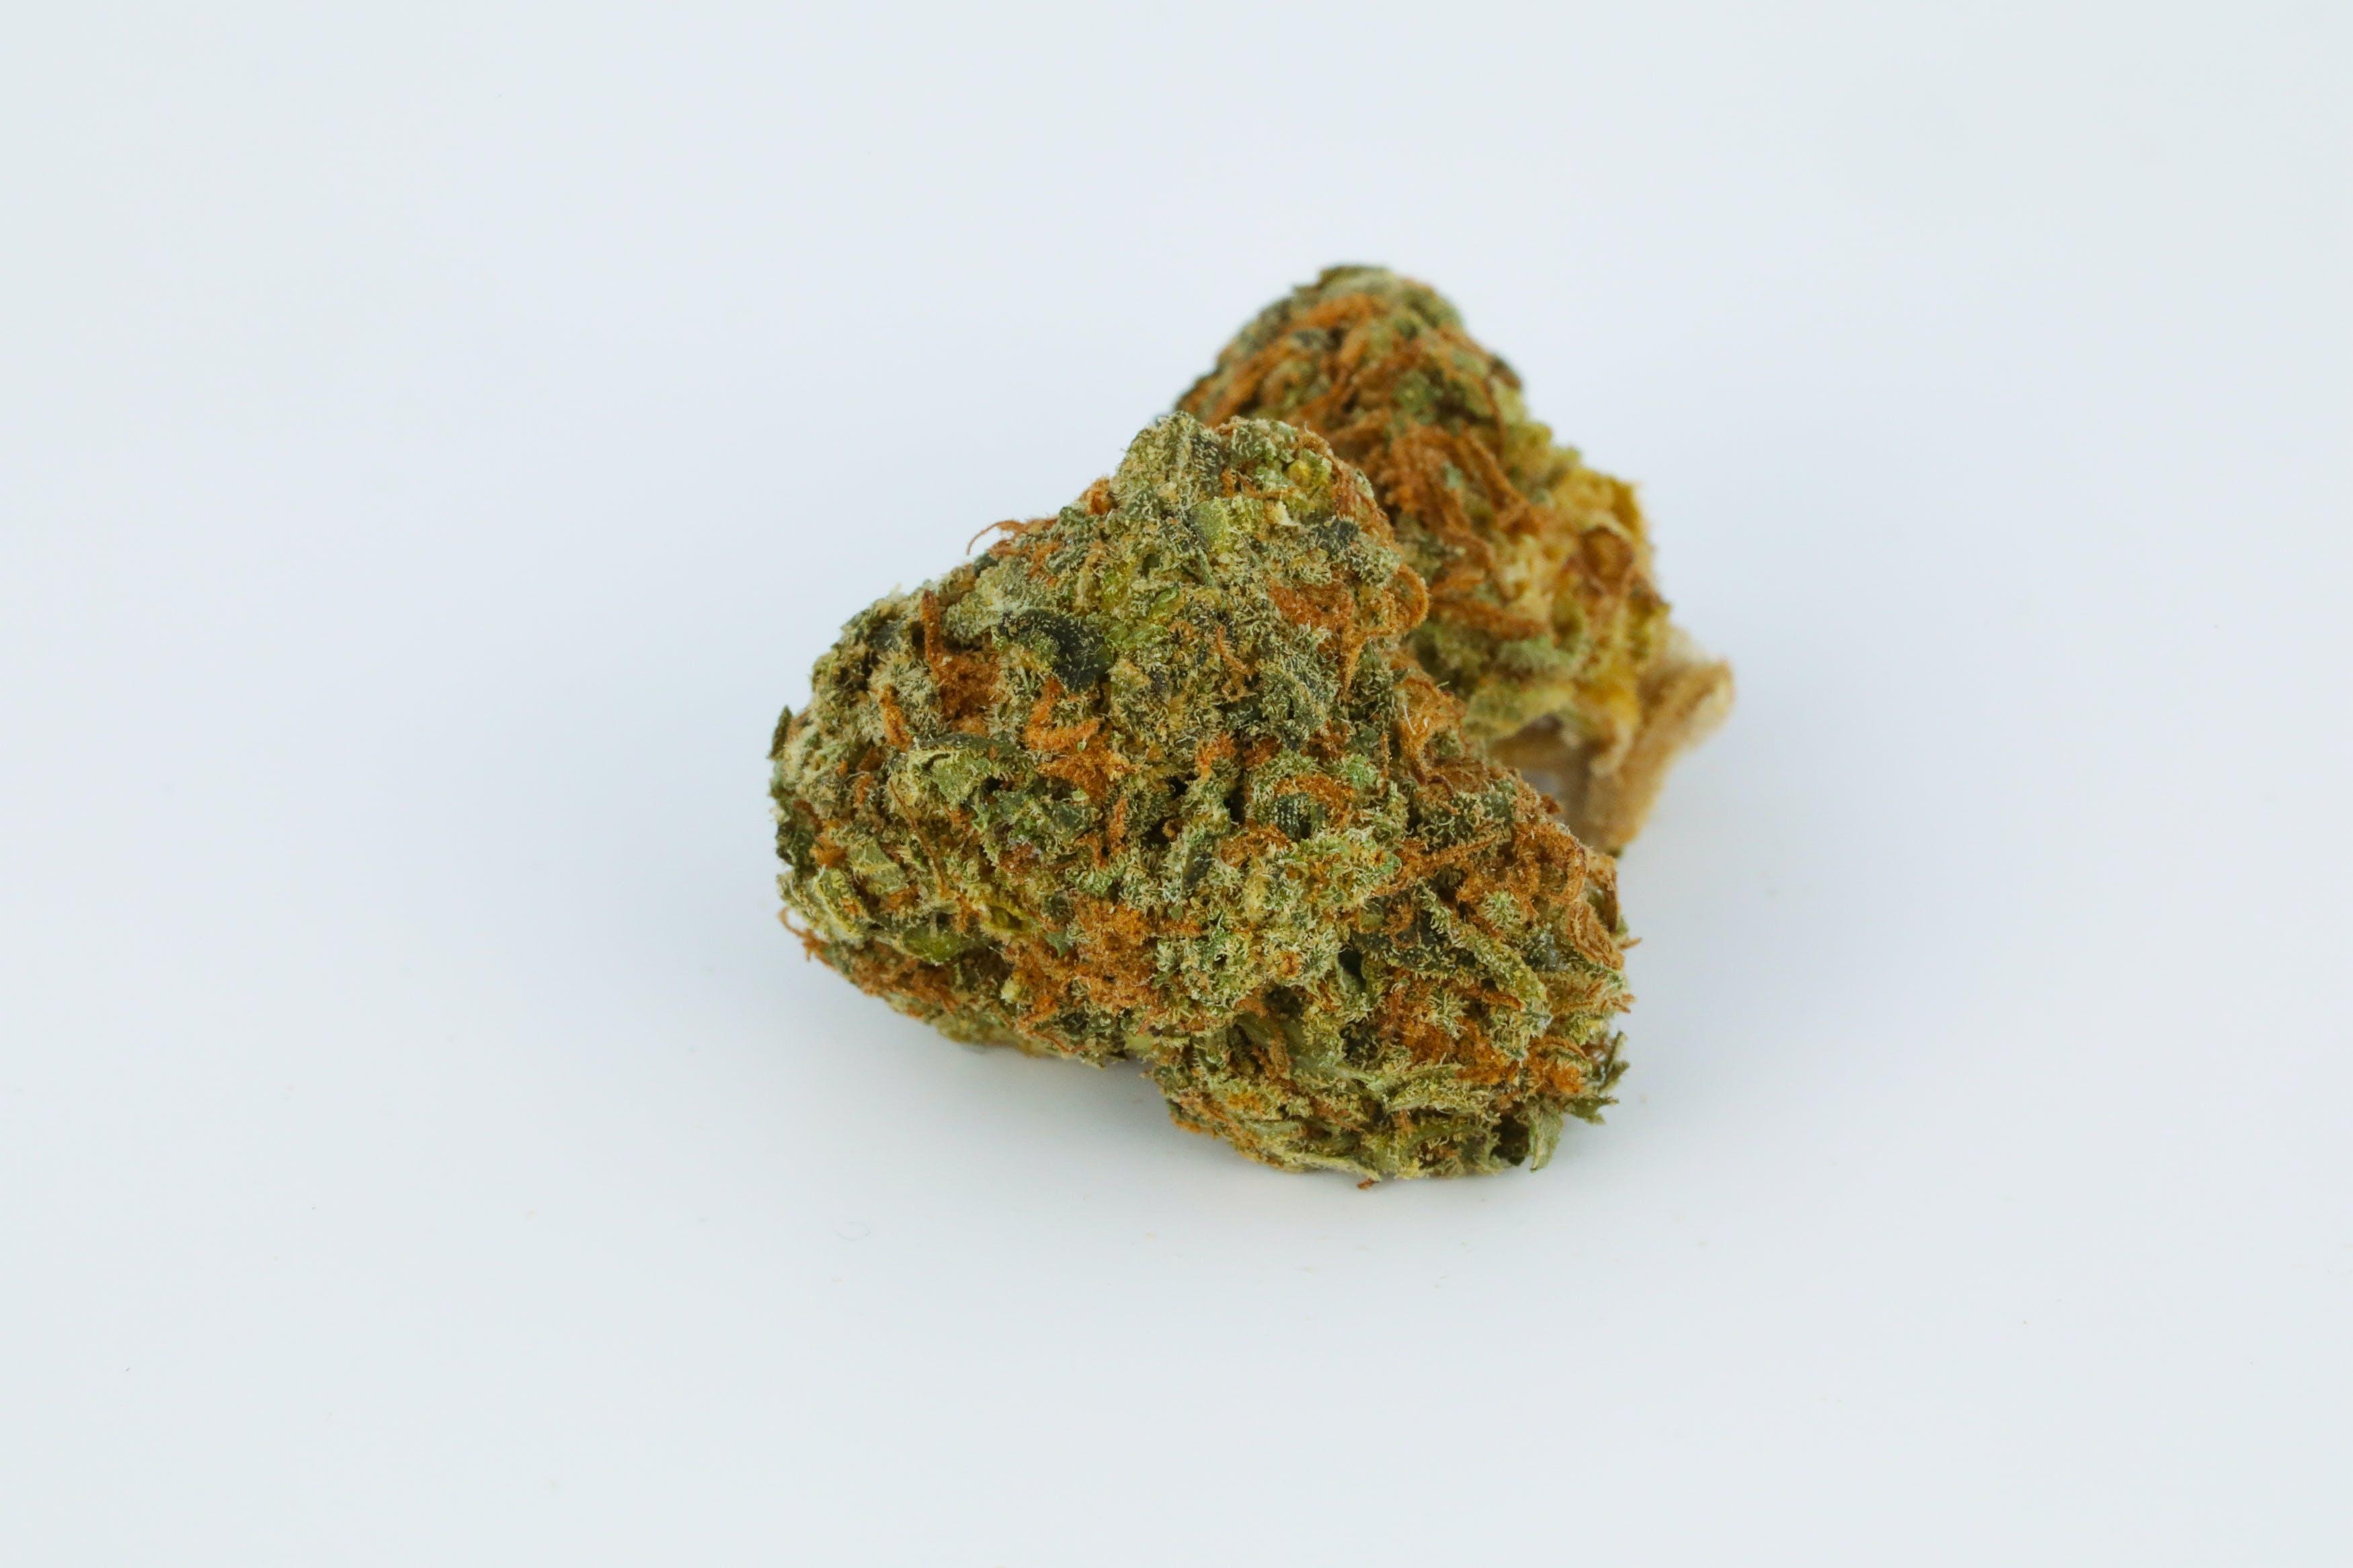 Stardawg Weed; Stardawg Cannabis Strain; Stardawg Hybrid Marijuana Strain